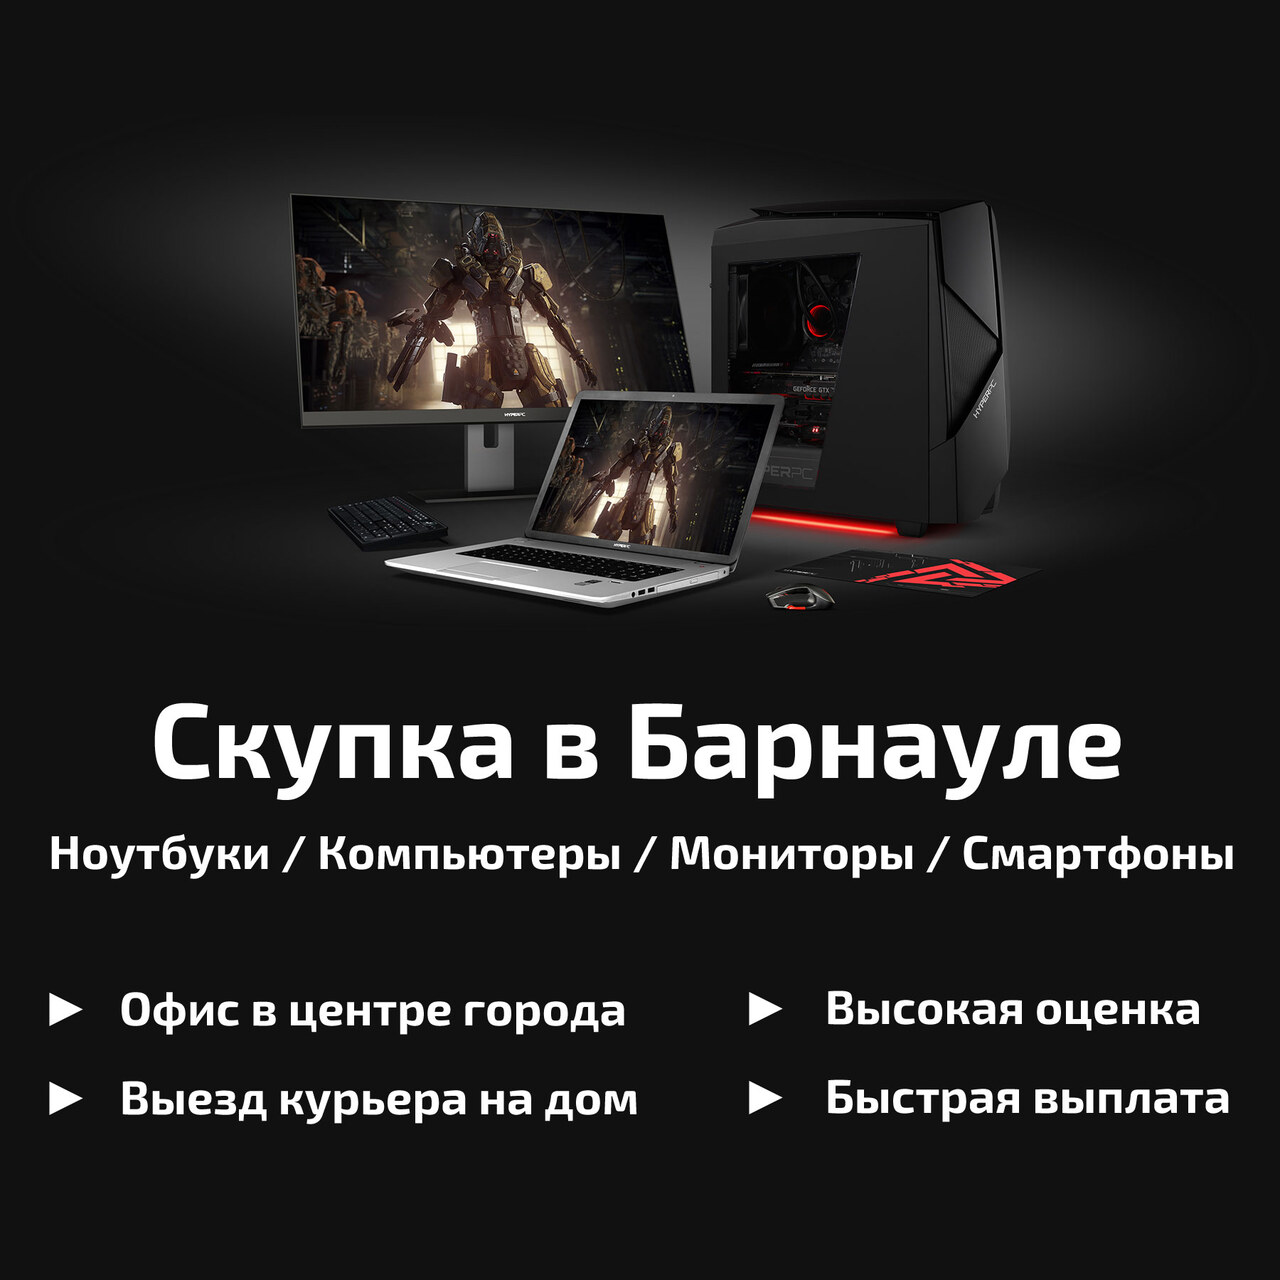 https://price-altai.ru/uploads/2018/10/3022544449457d.jpg